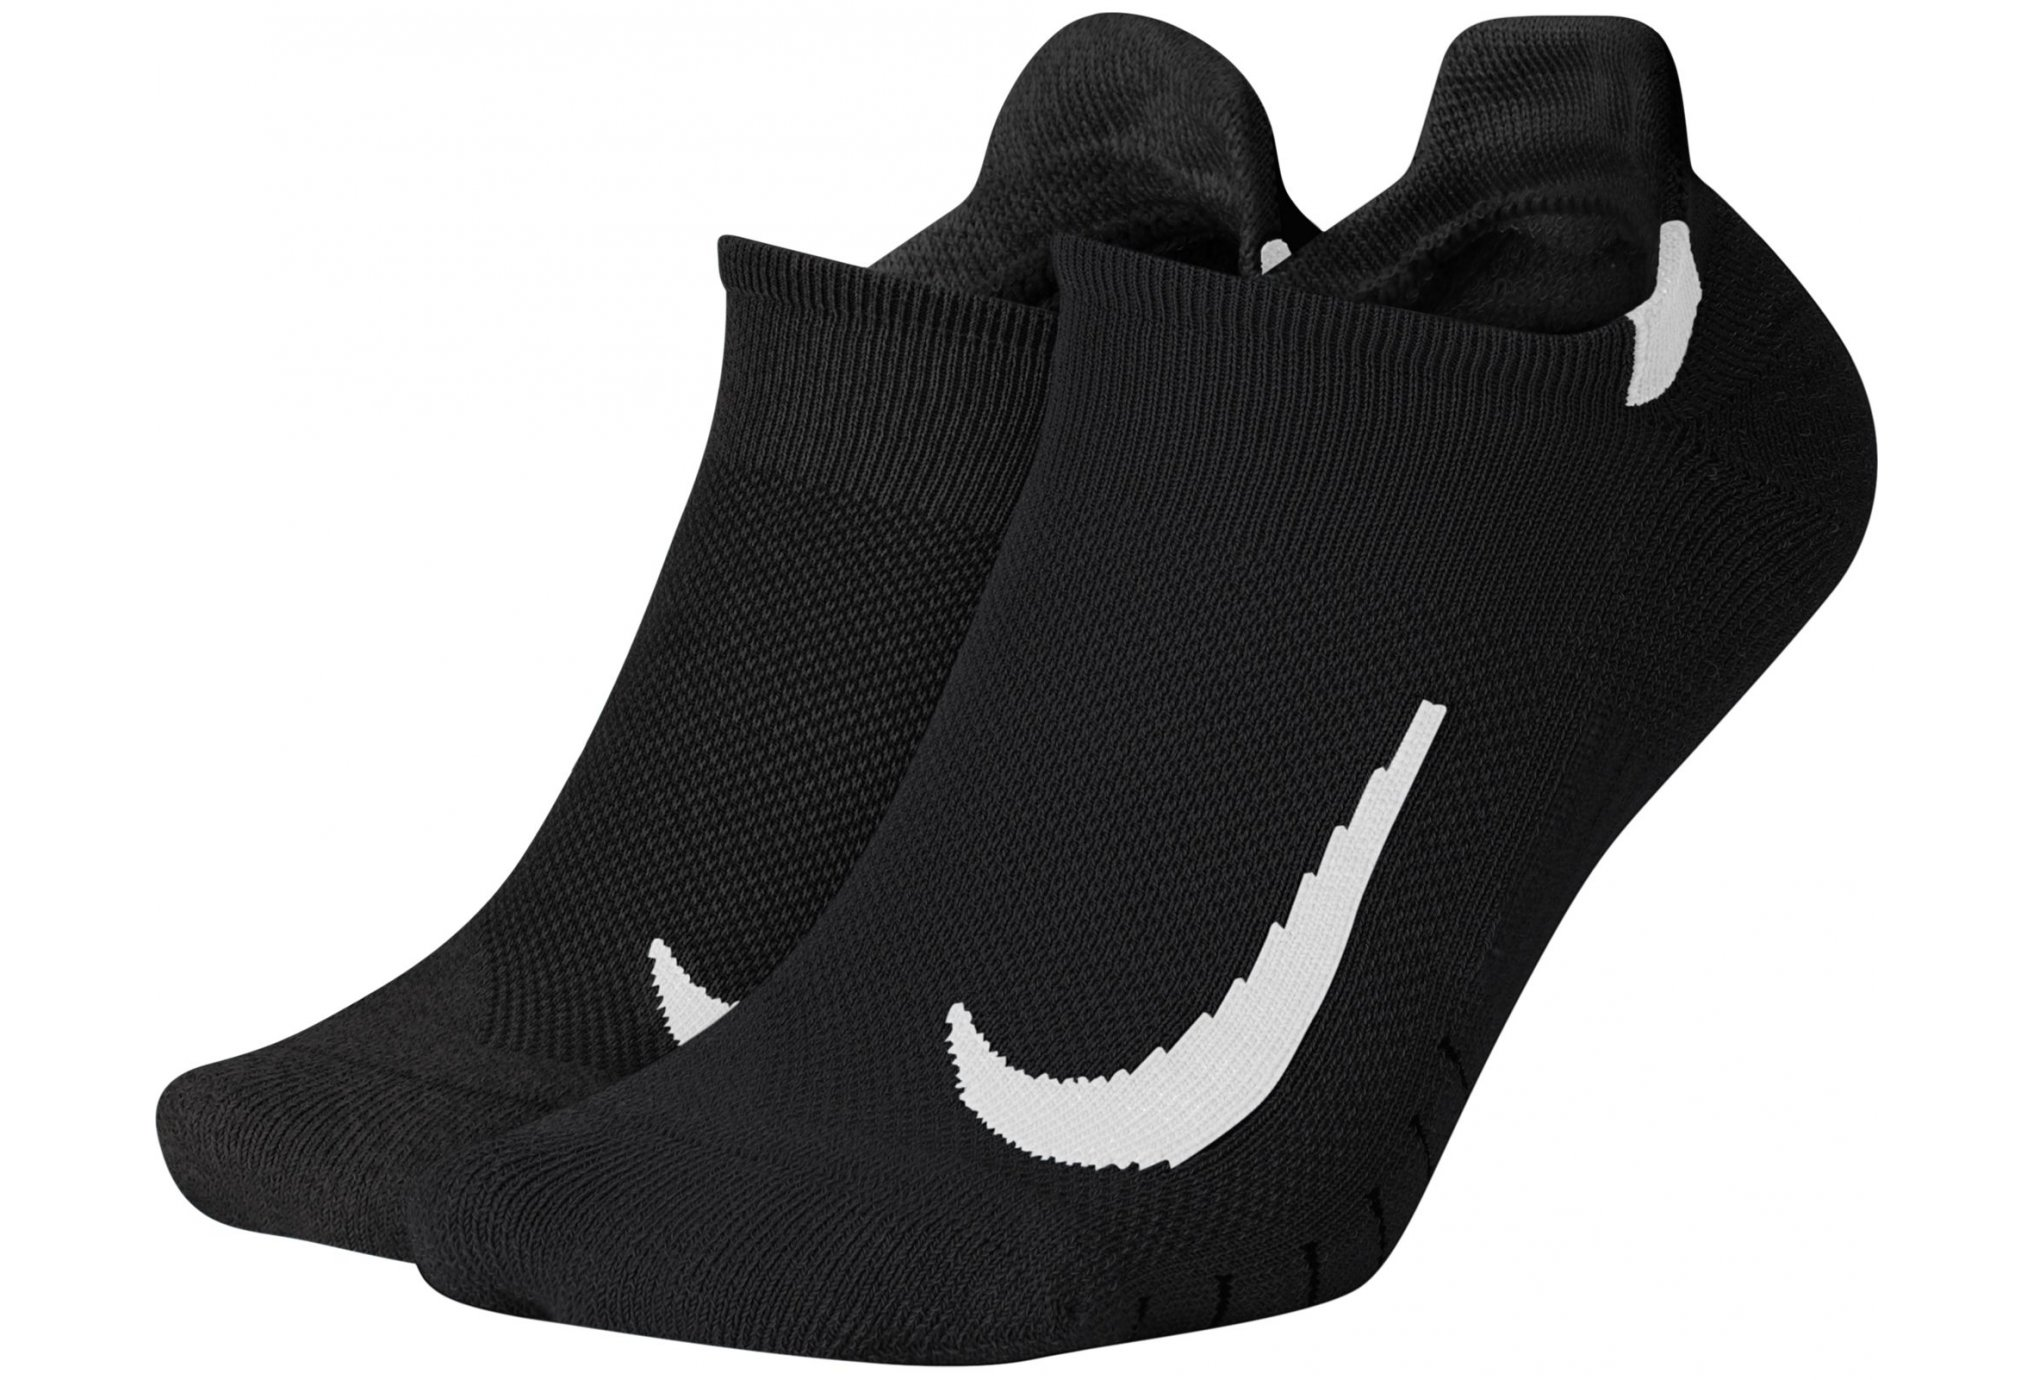 Nike 2 paires Multiplier No-Show Chaussettes